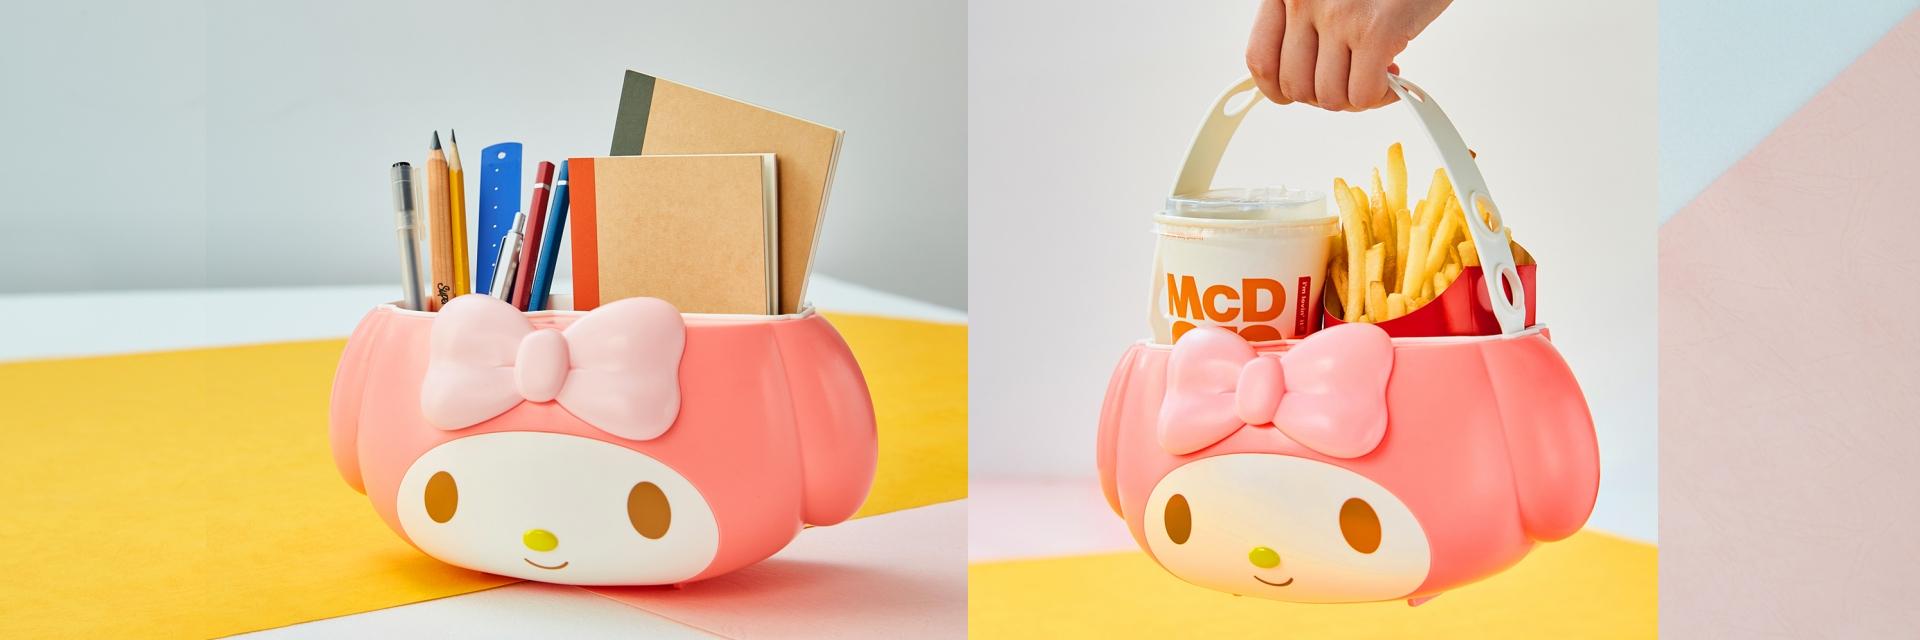 J 個超欠收!麥當勞推出這個加價購真的太狂啦~美樂蒂粉絲預備出動!